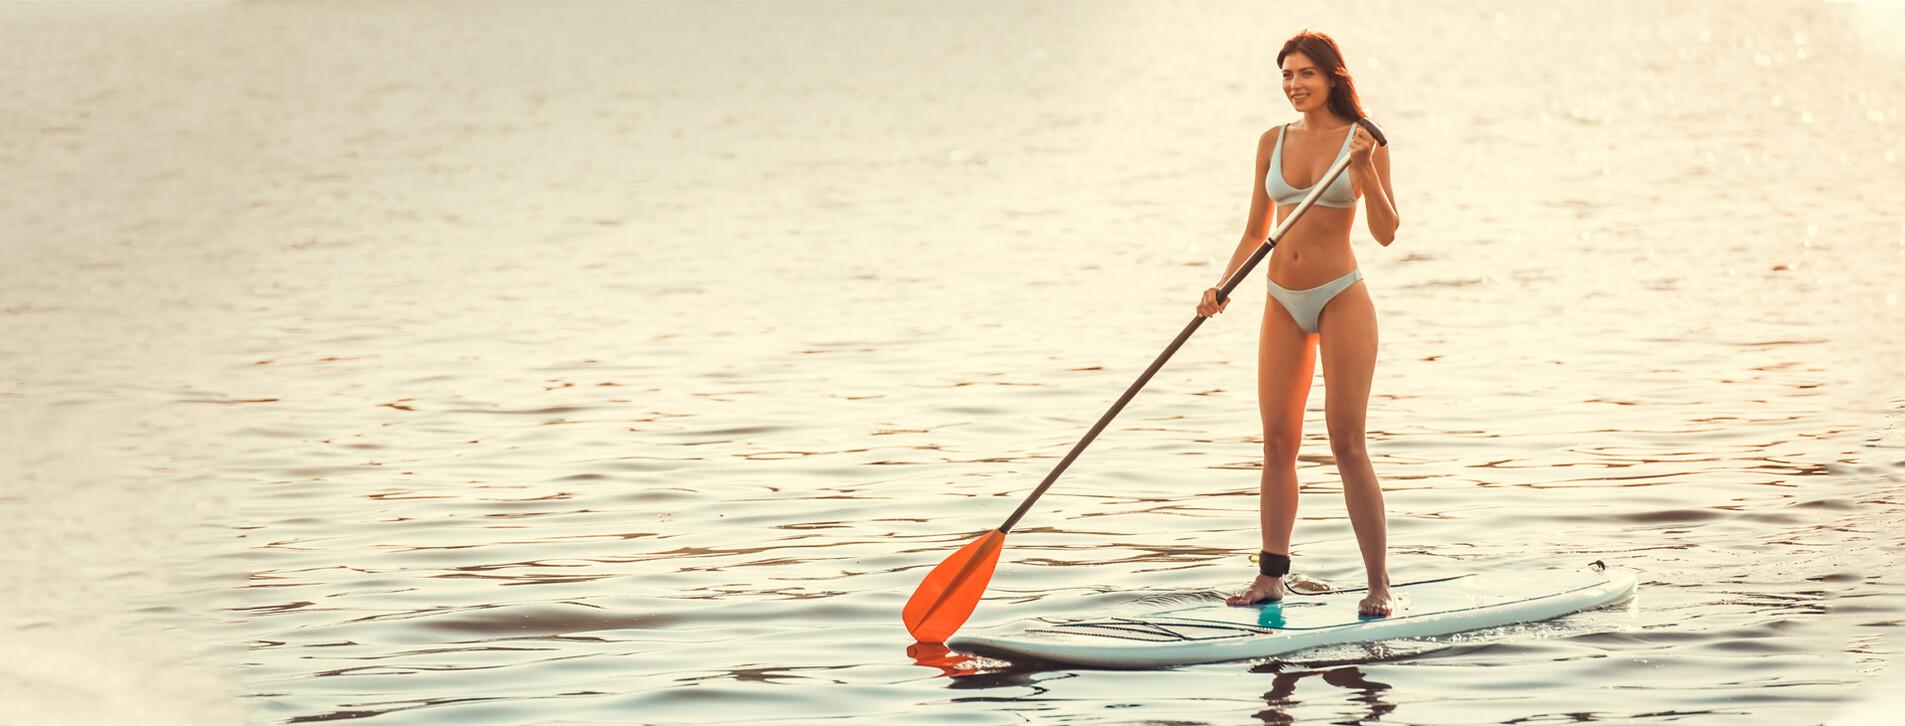 Fotoğraf 1 - Stand Up Paddle Turu